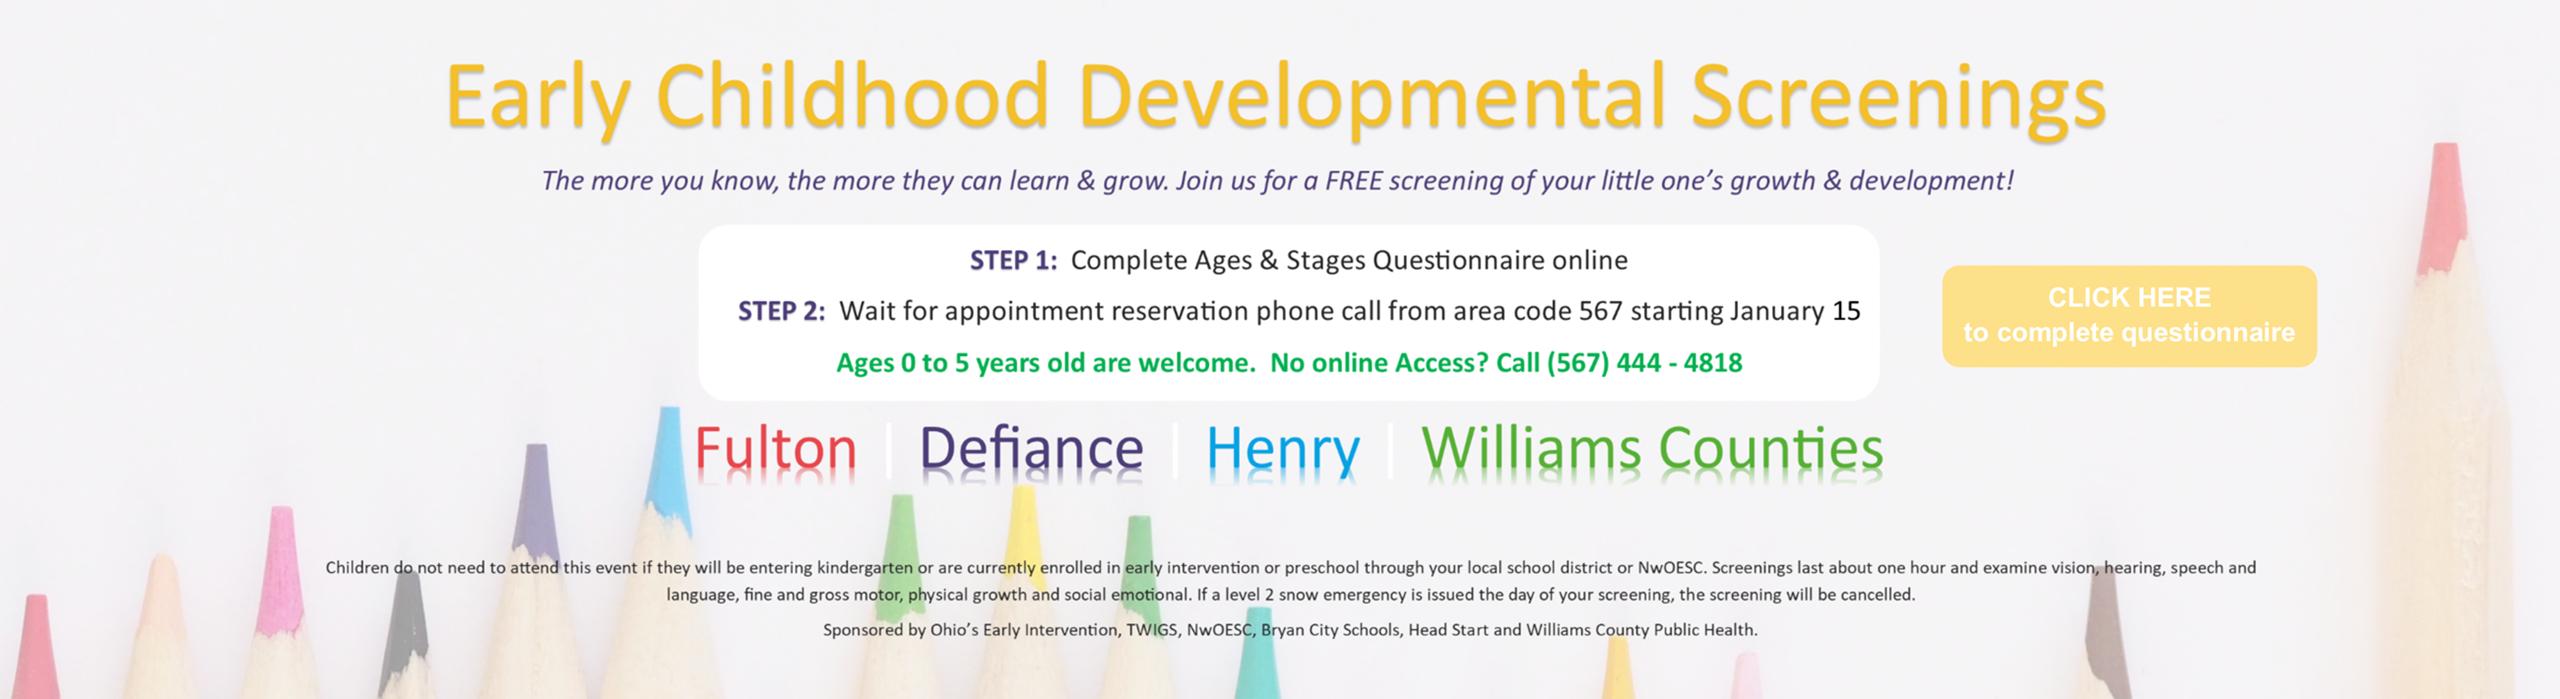 Free Early Childhood Developmental Screenings available.